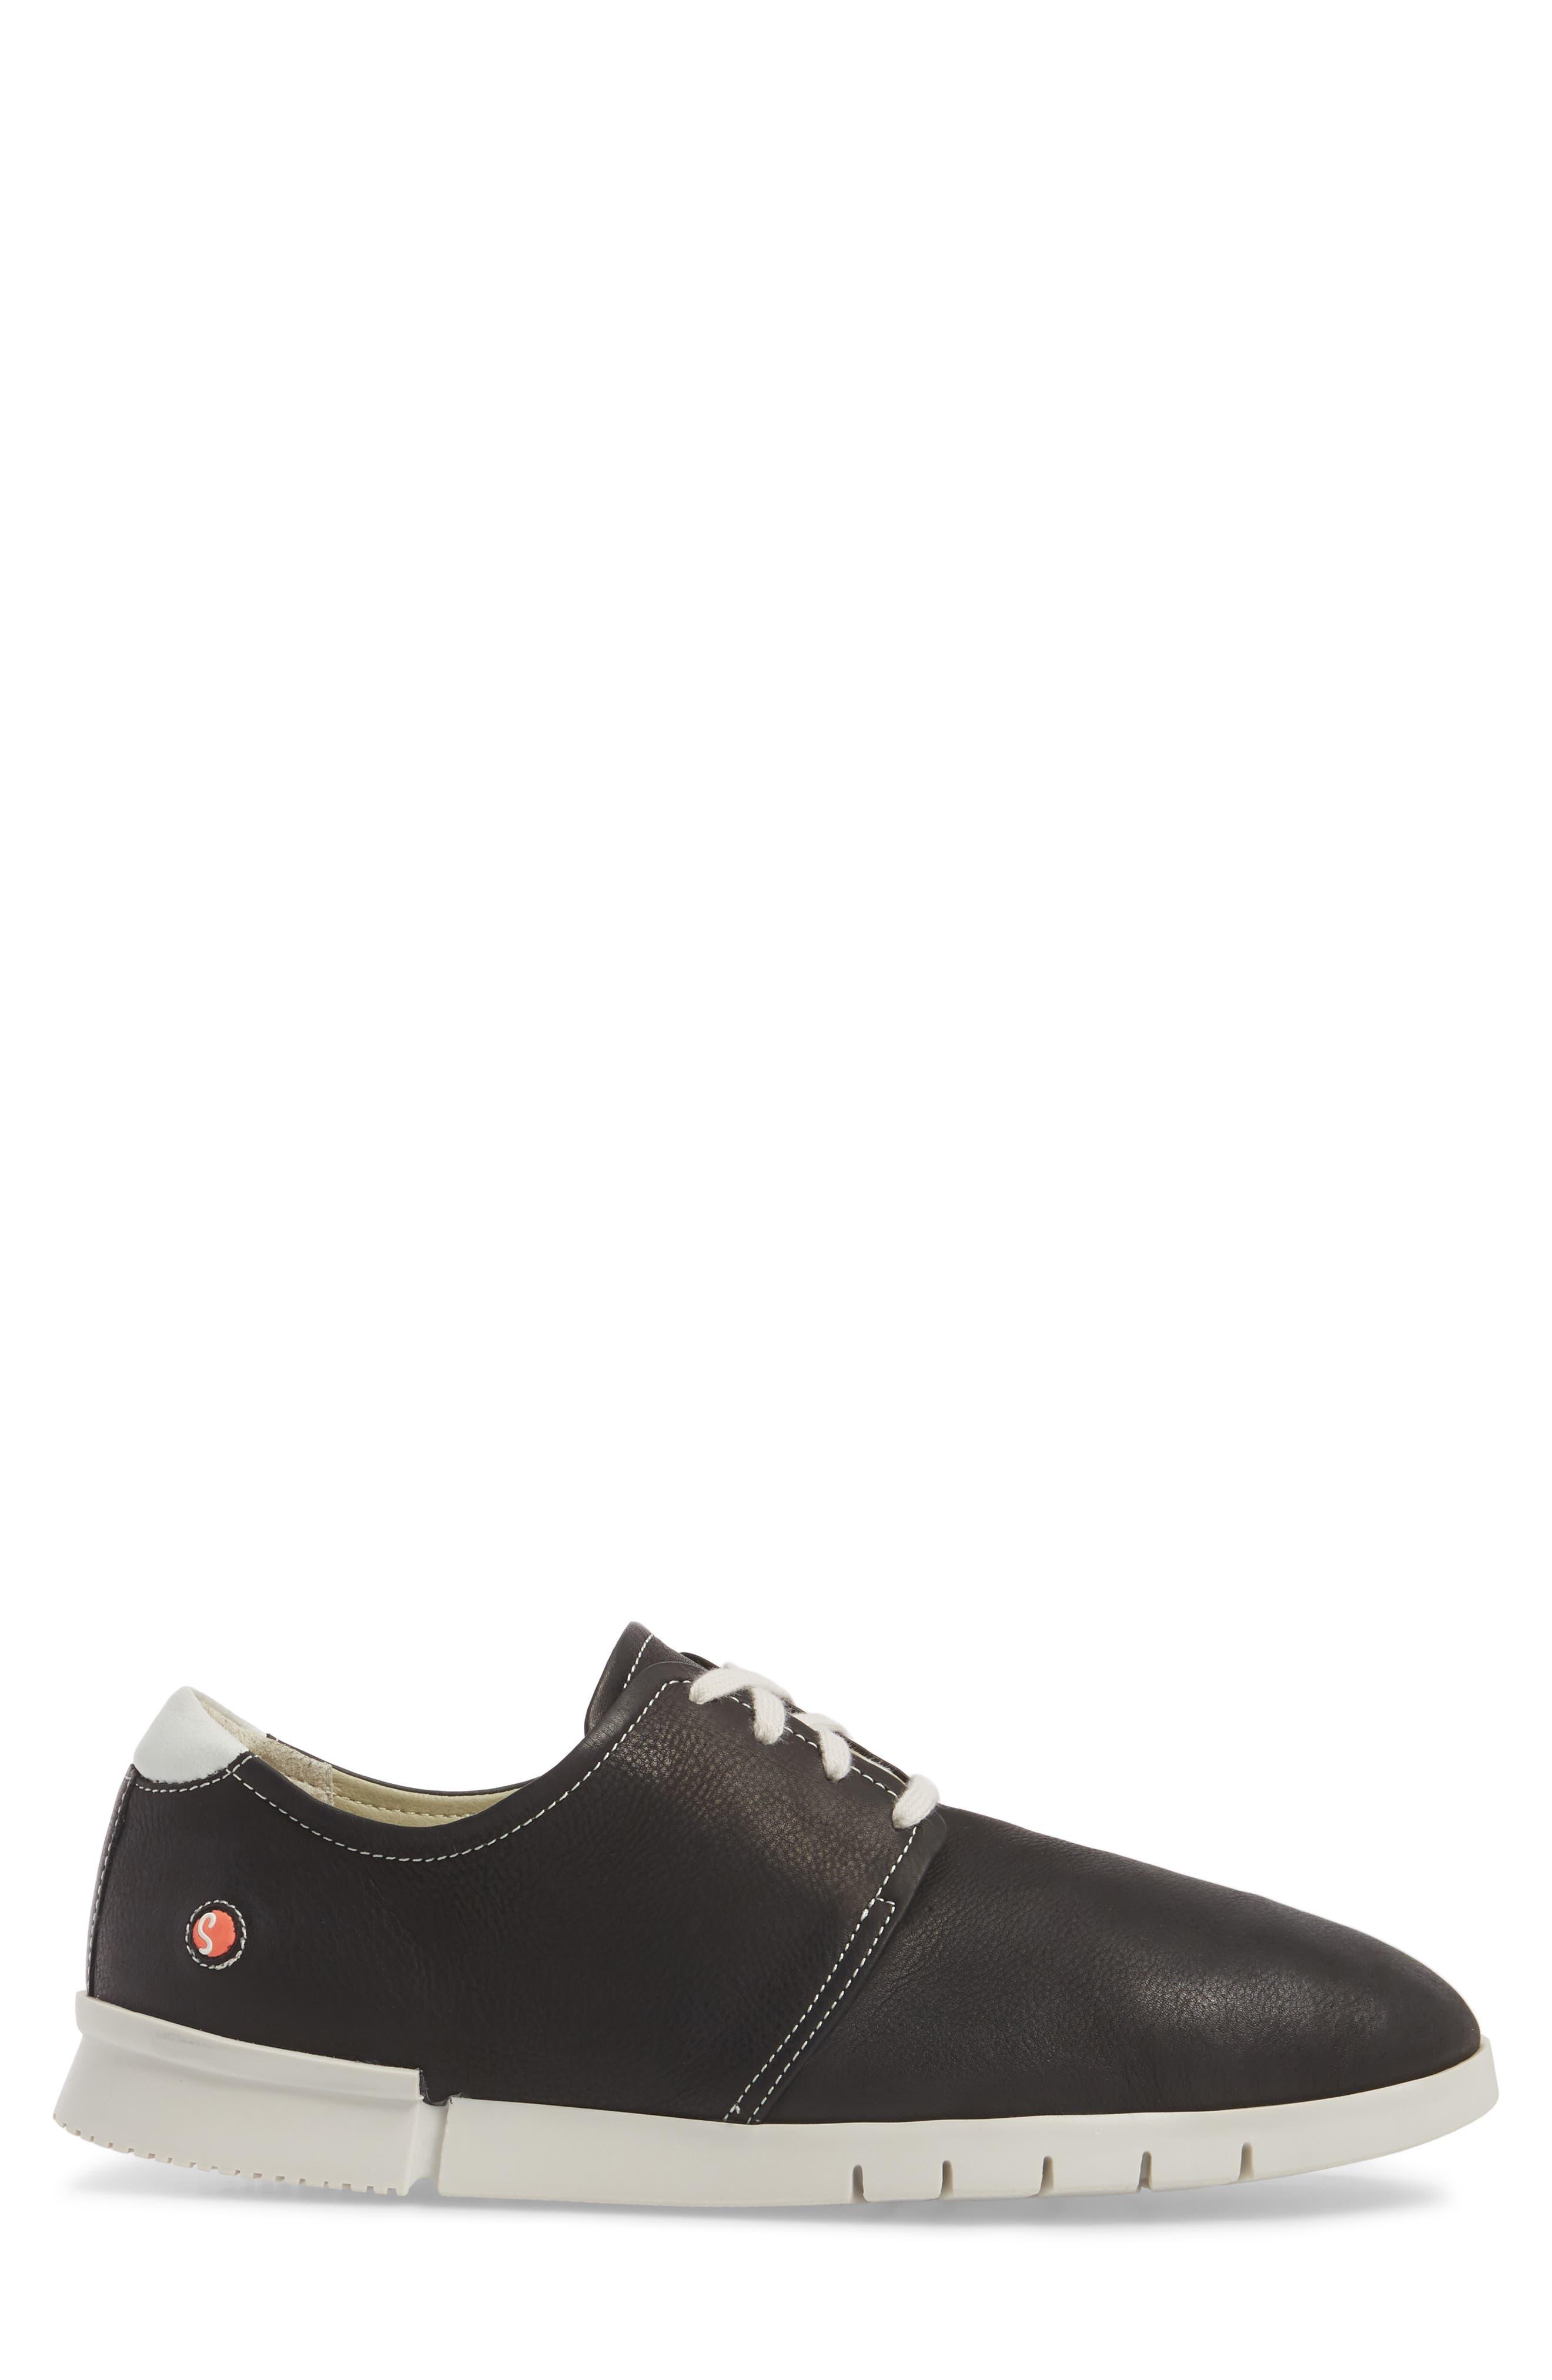 Alternate Image 3  - Softinos by Fly London Cap Low Top Sneaker (Men)